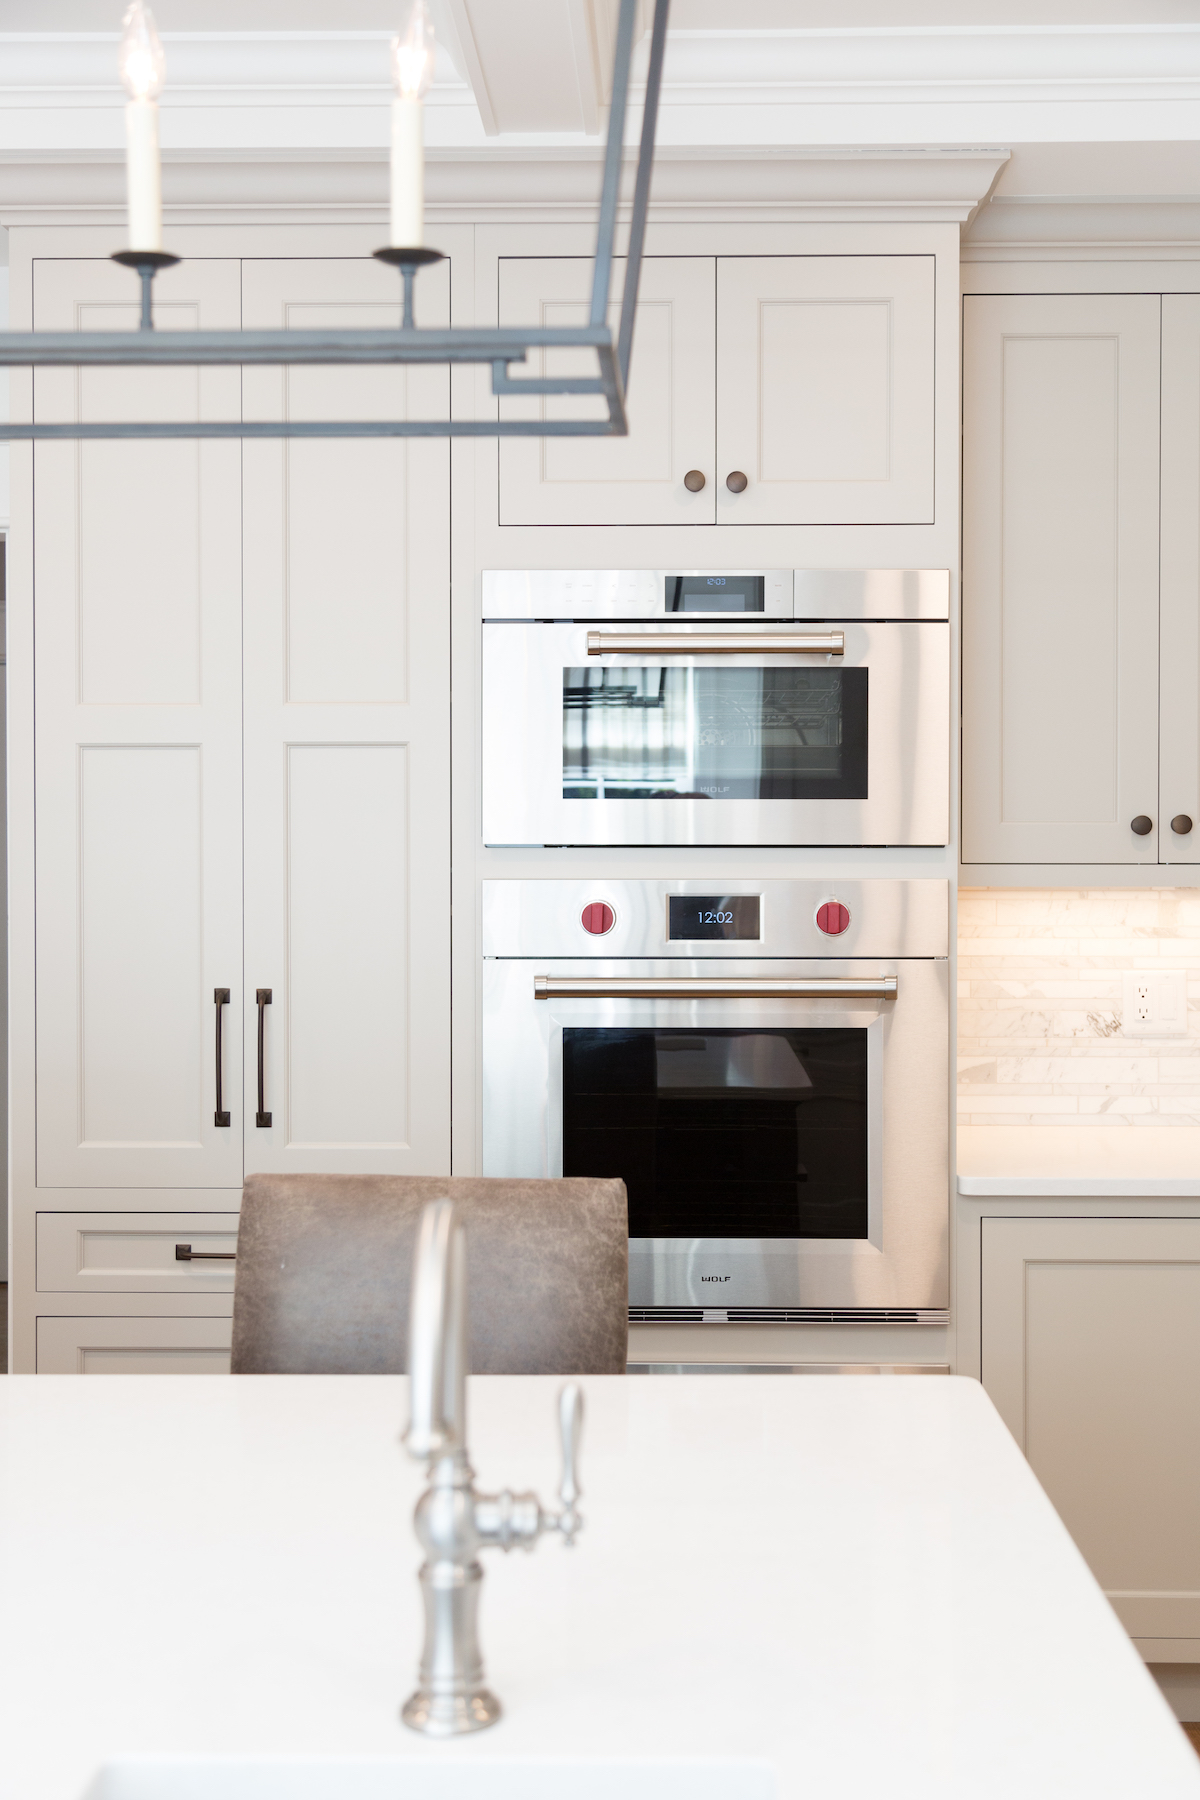 Kitchen Lighting, Sinks, and Windows